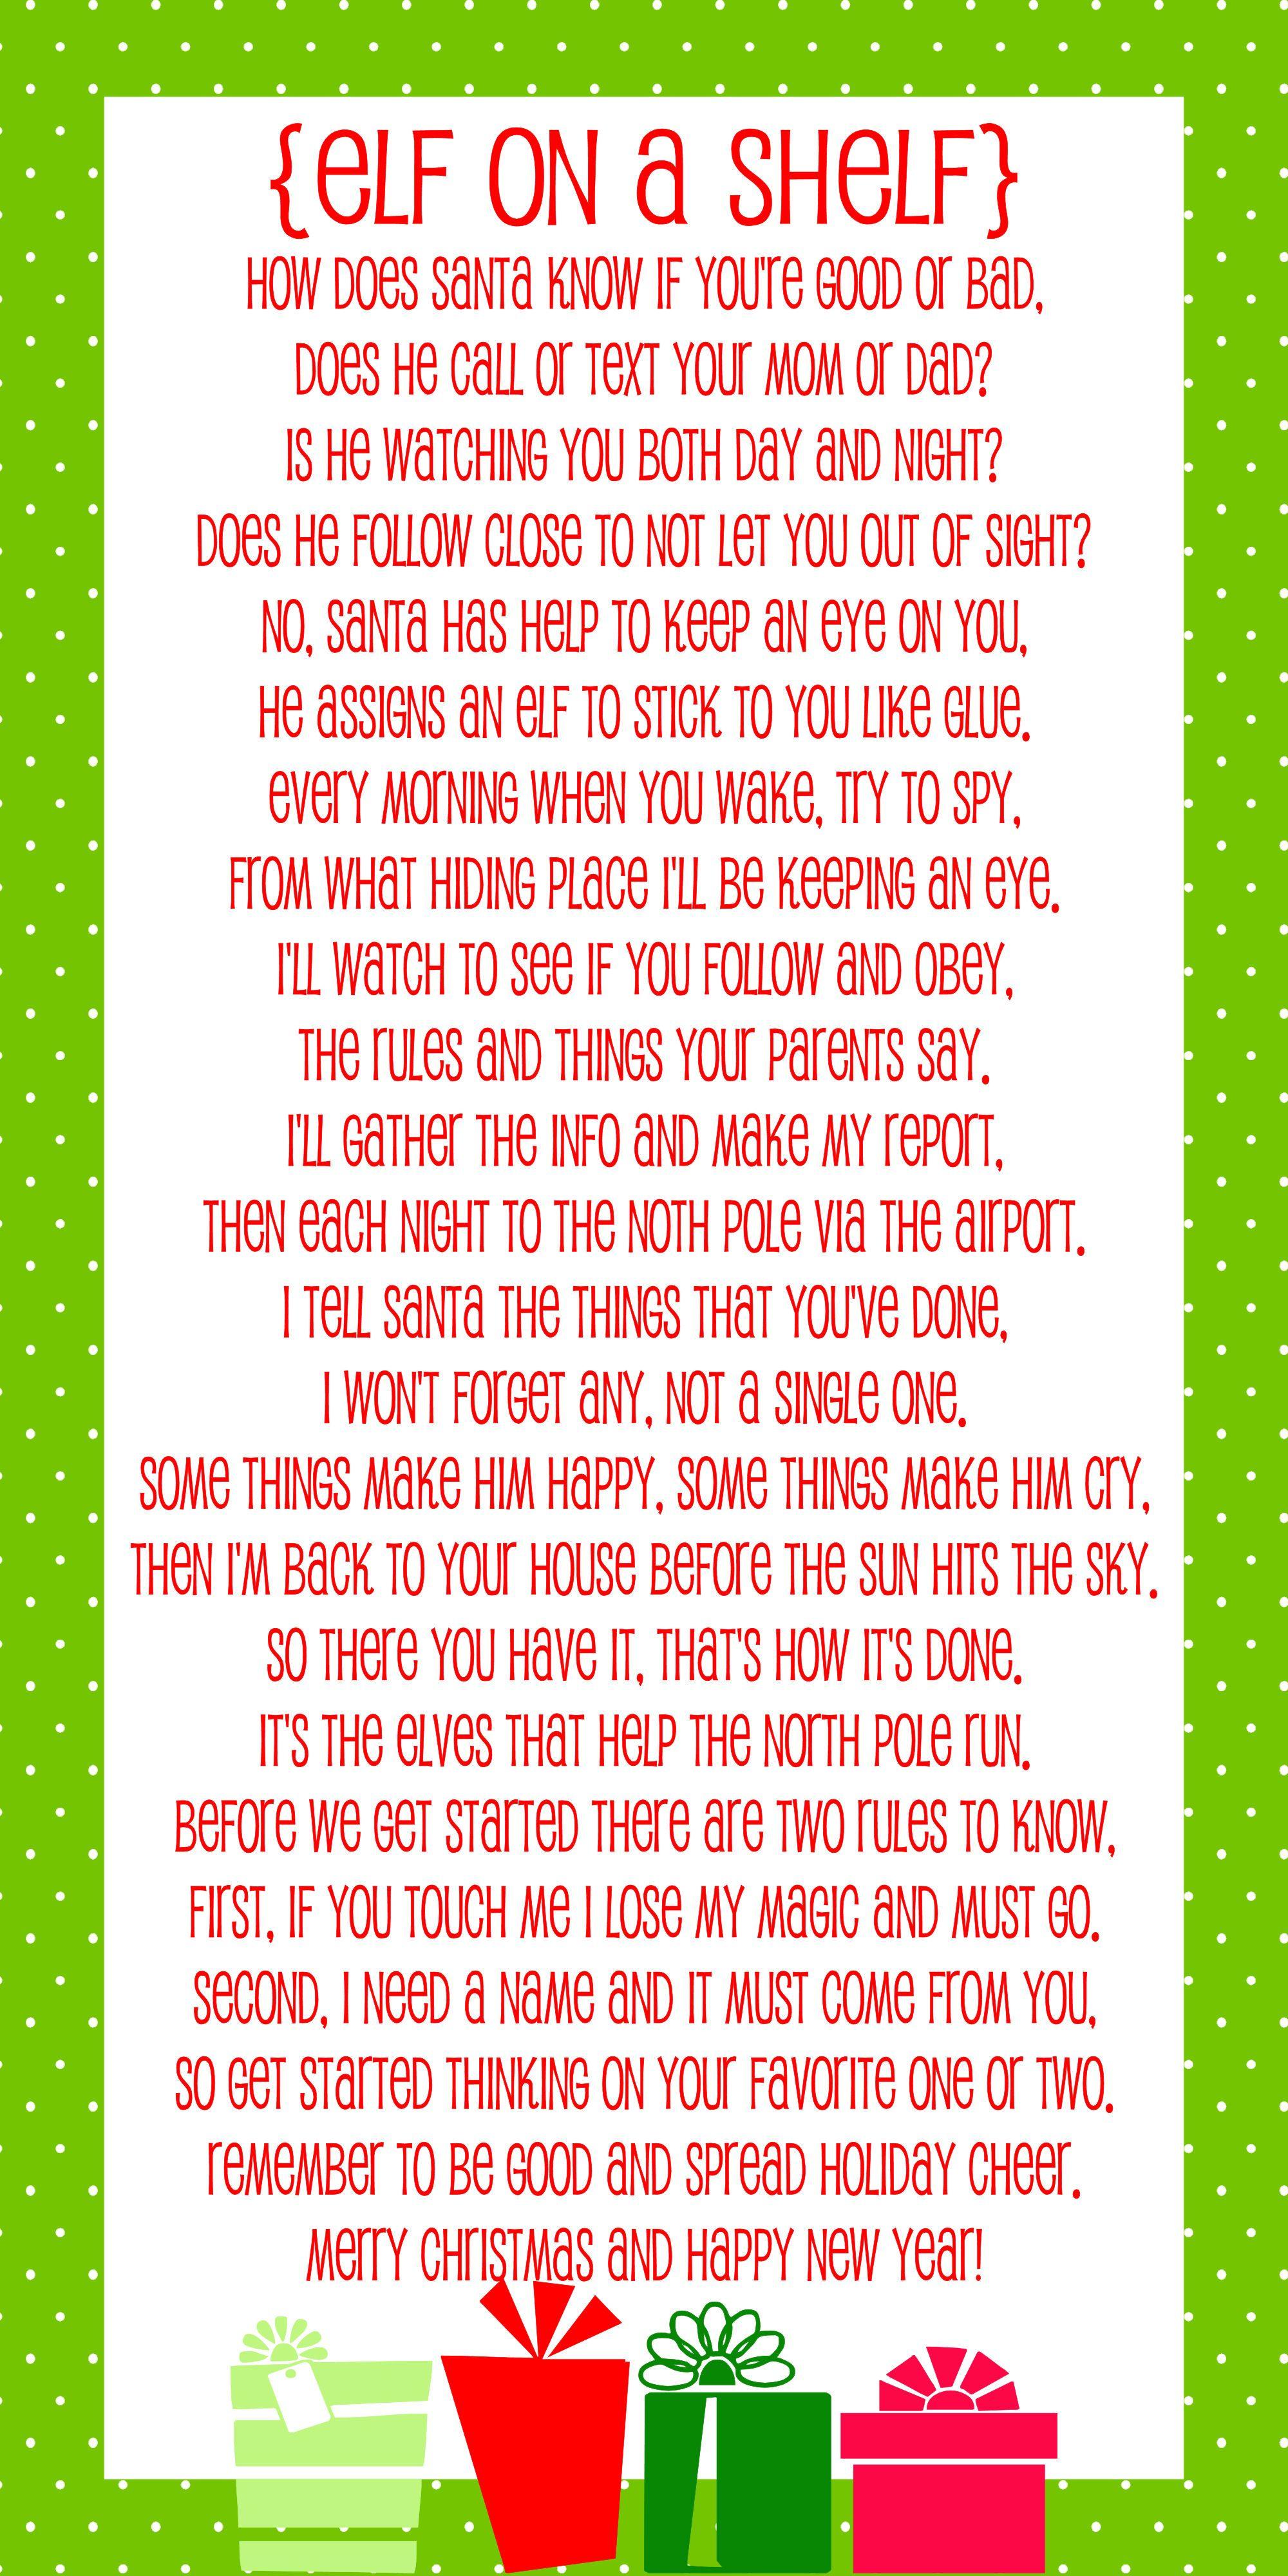 Elf On The Shelf Story - Free Printable Poem   Christmas   Elf On - Free Printable Elf On The Shelf Story